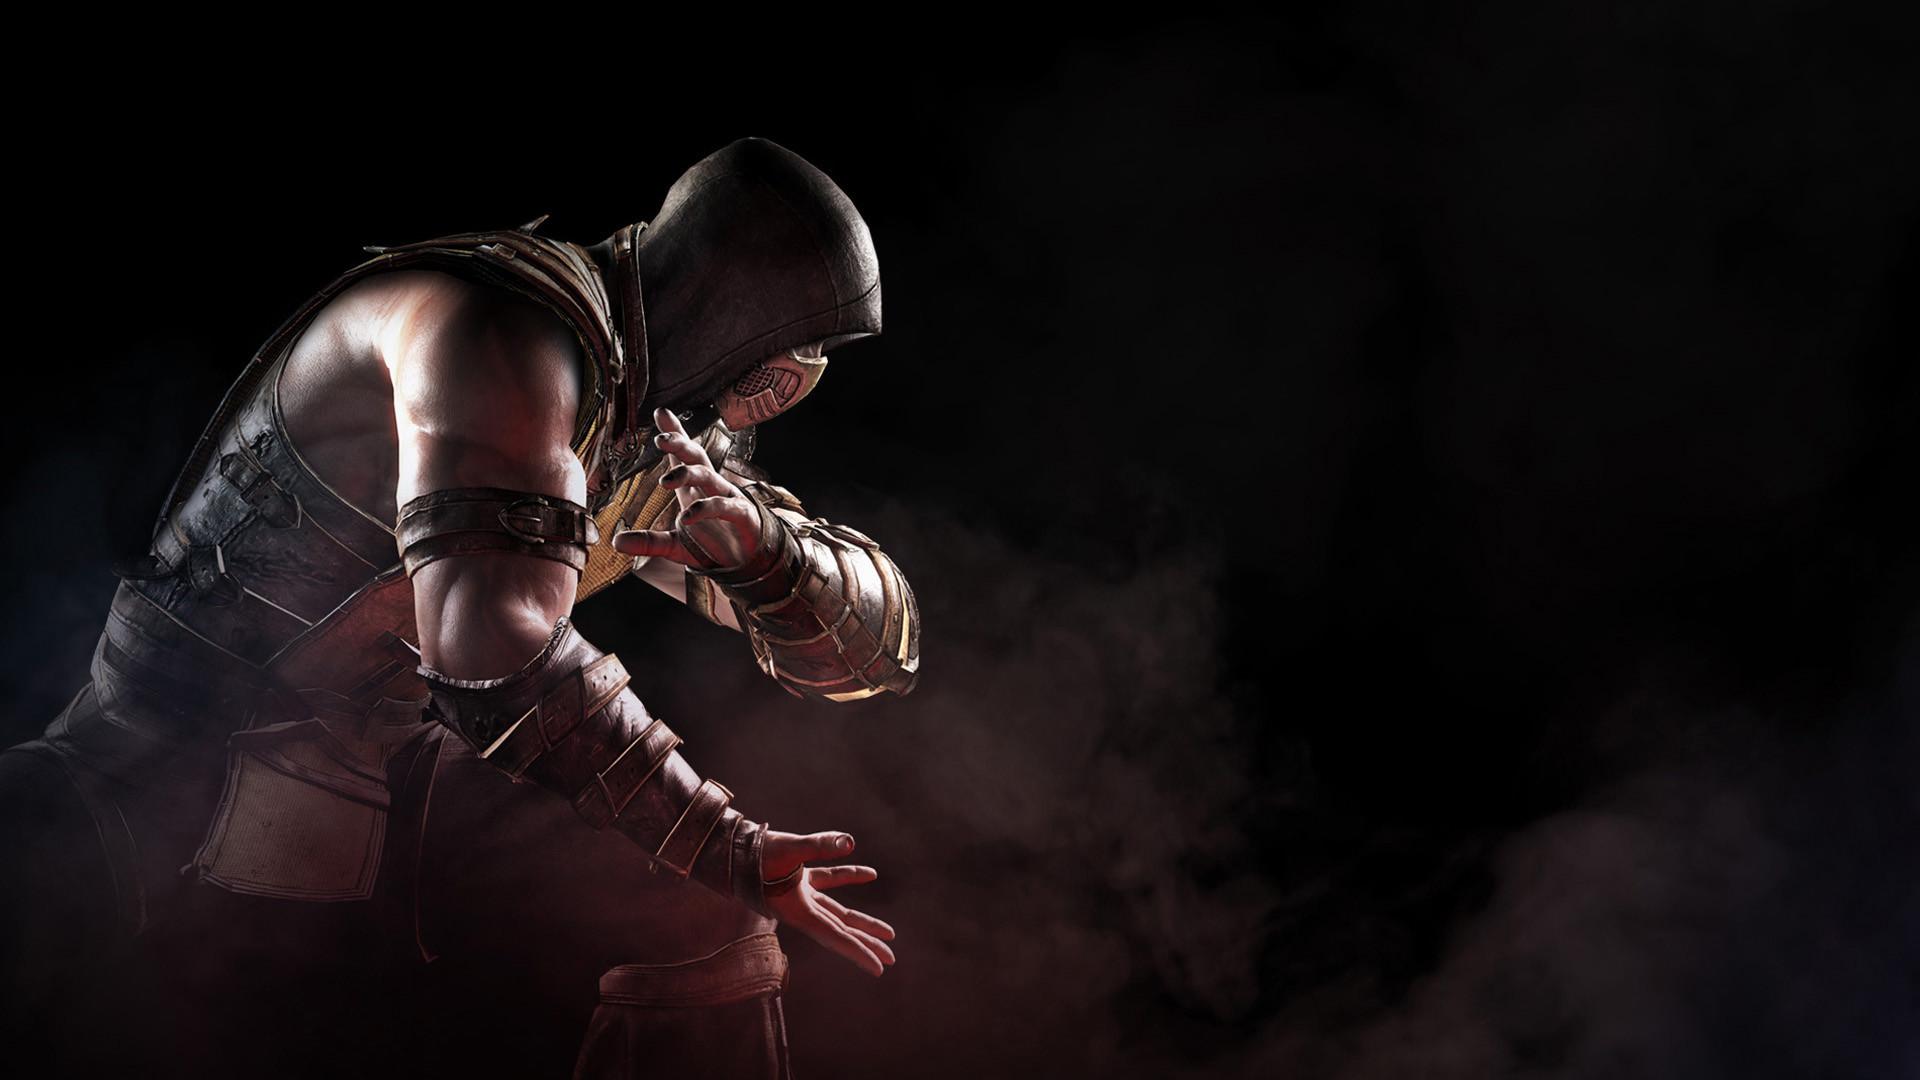 Mortal Kombat X – Scorpion | Steam Trading Cards Wiki | FANDOM powered by  Wikia